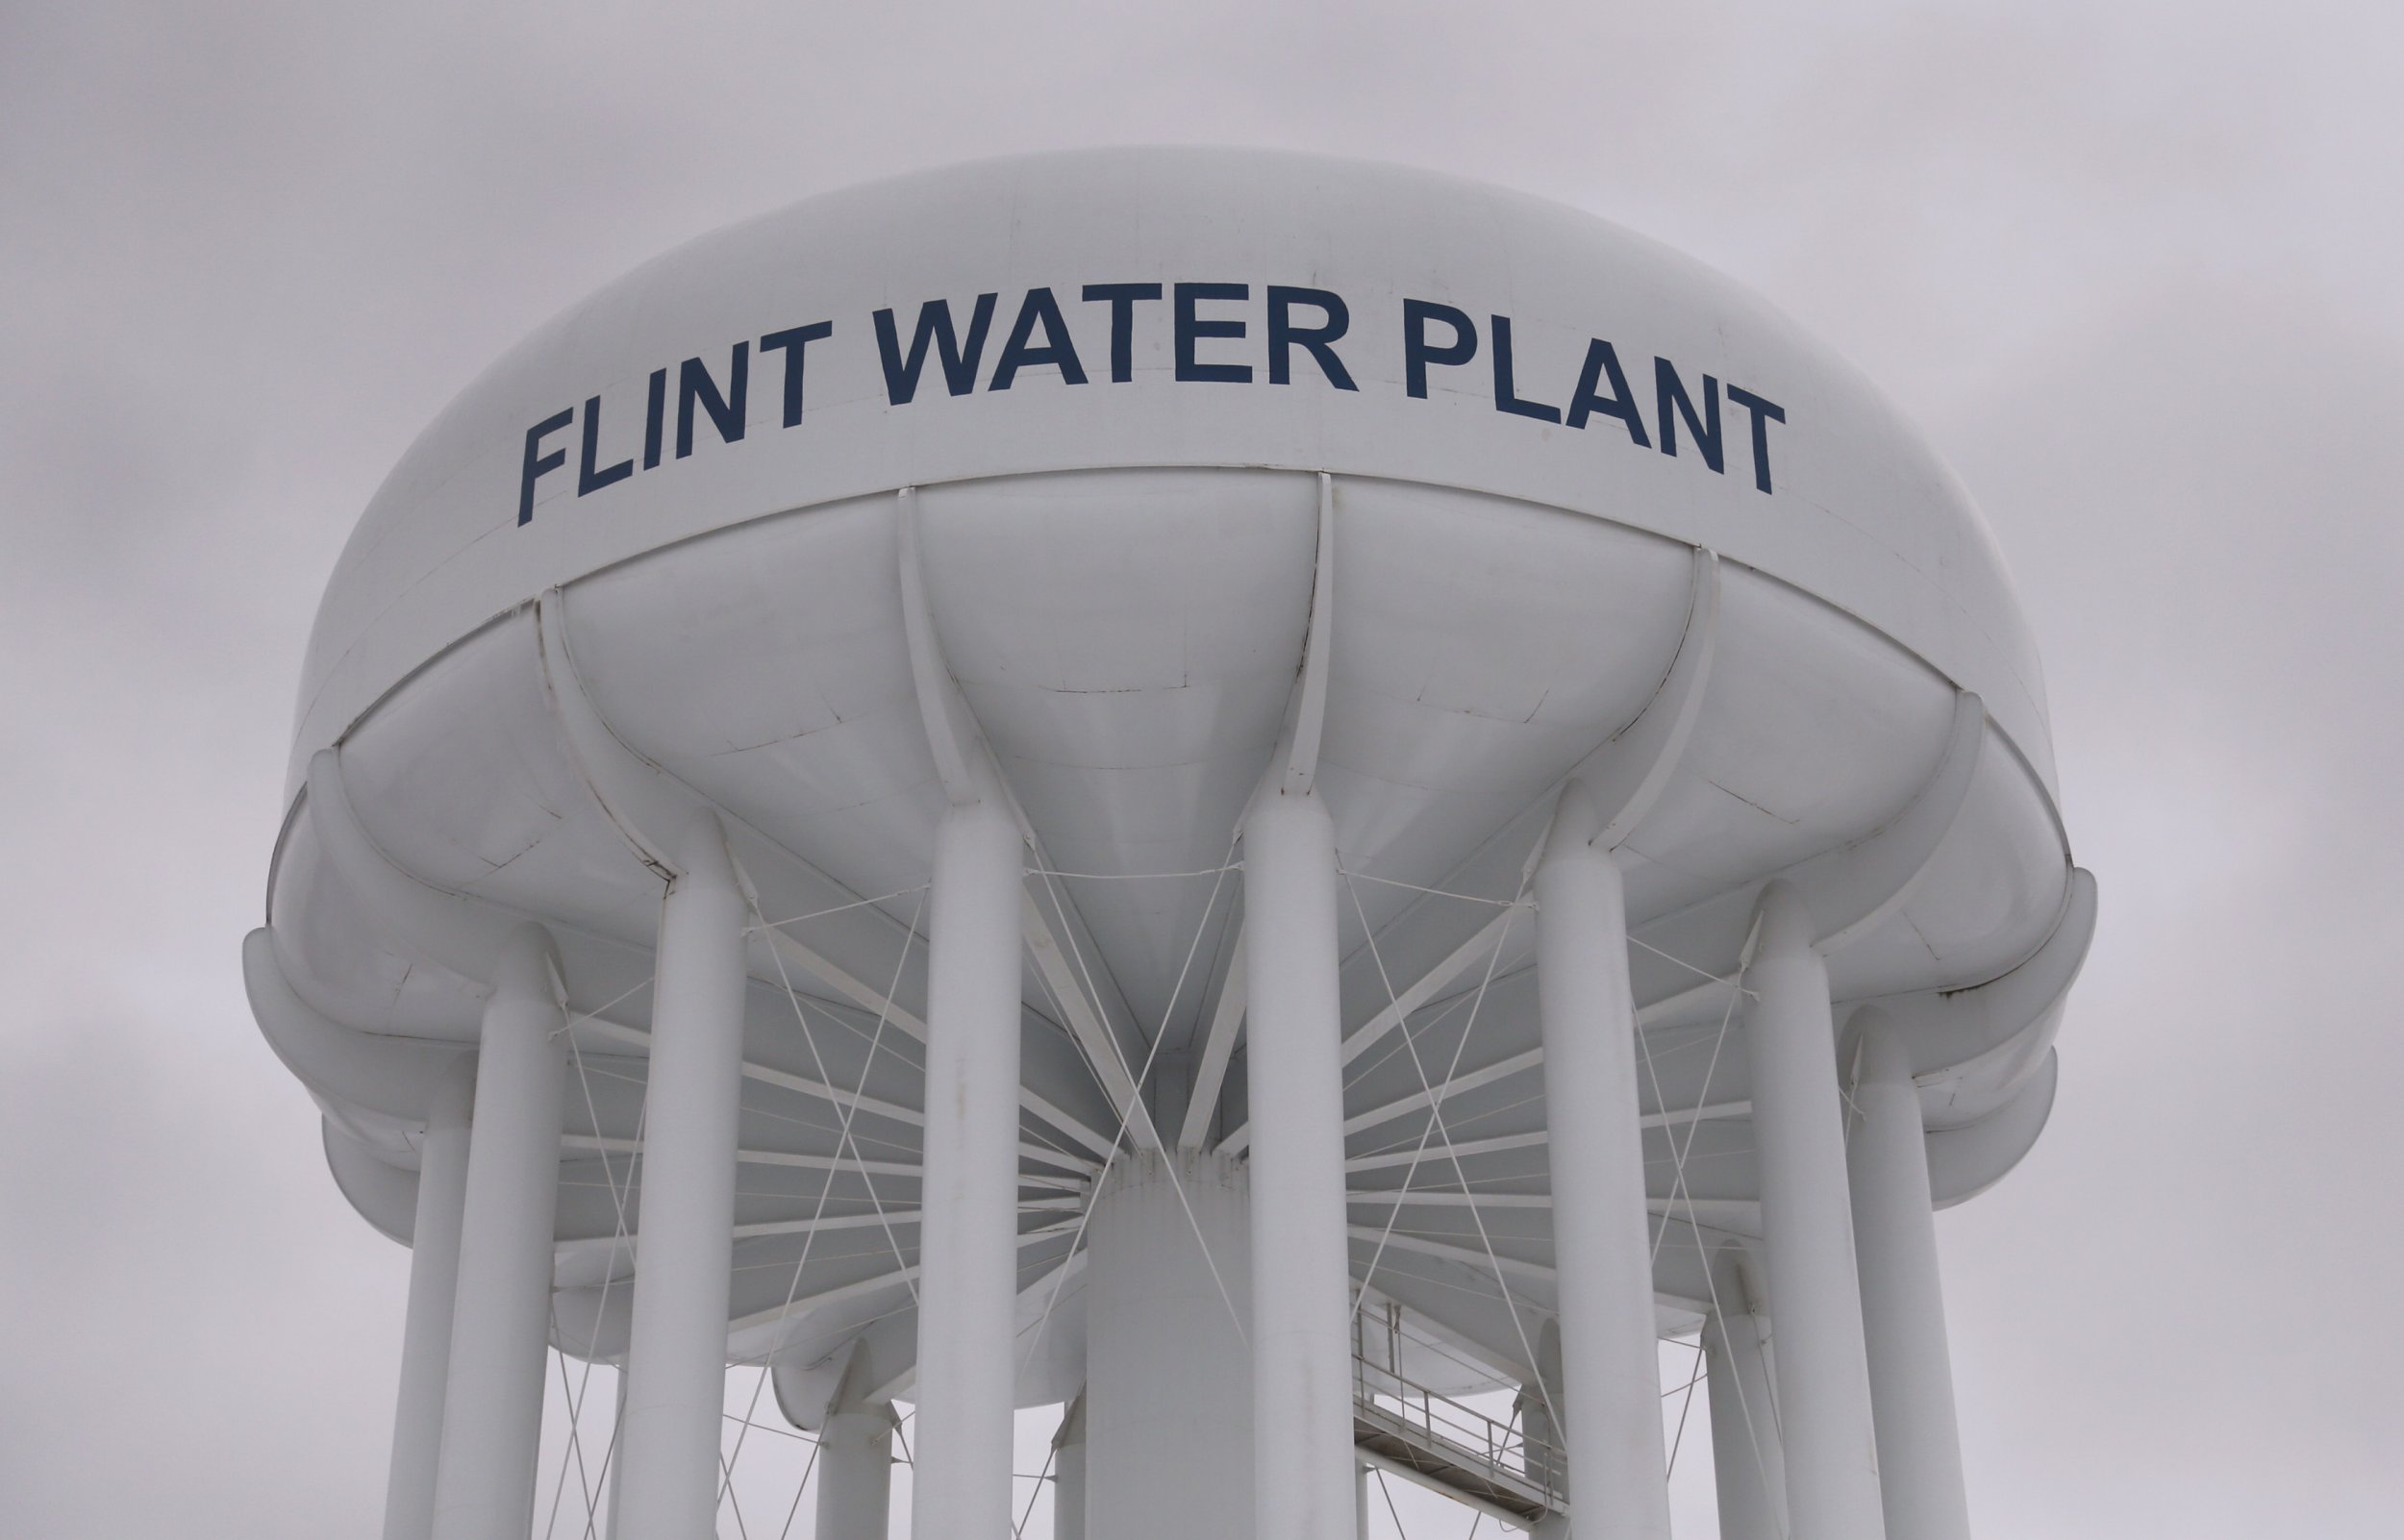 Flint Residents Betrayed By Water Crisis Jesse Jackson